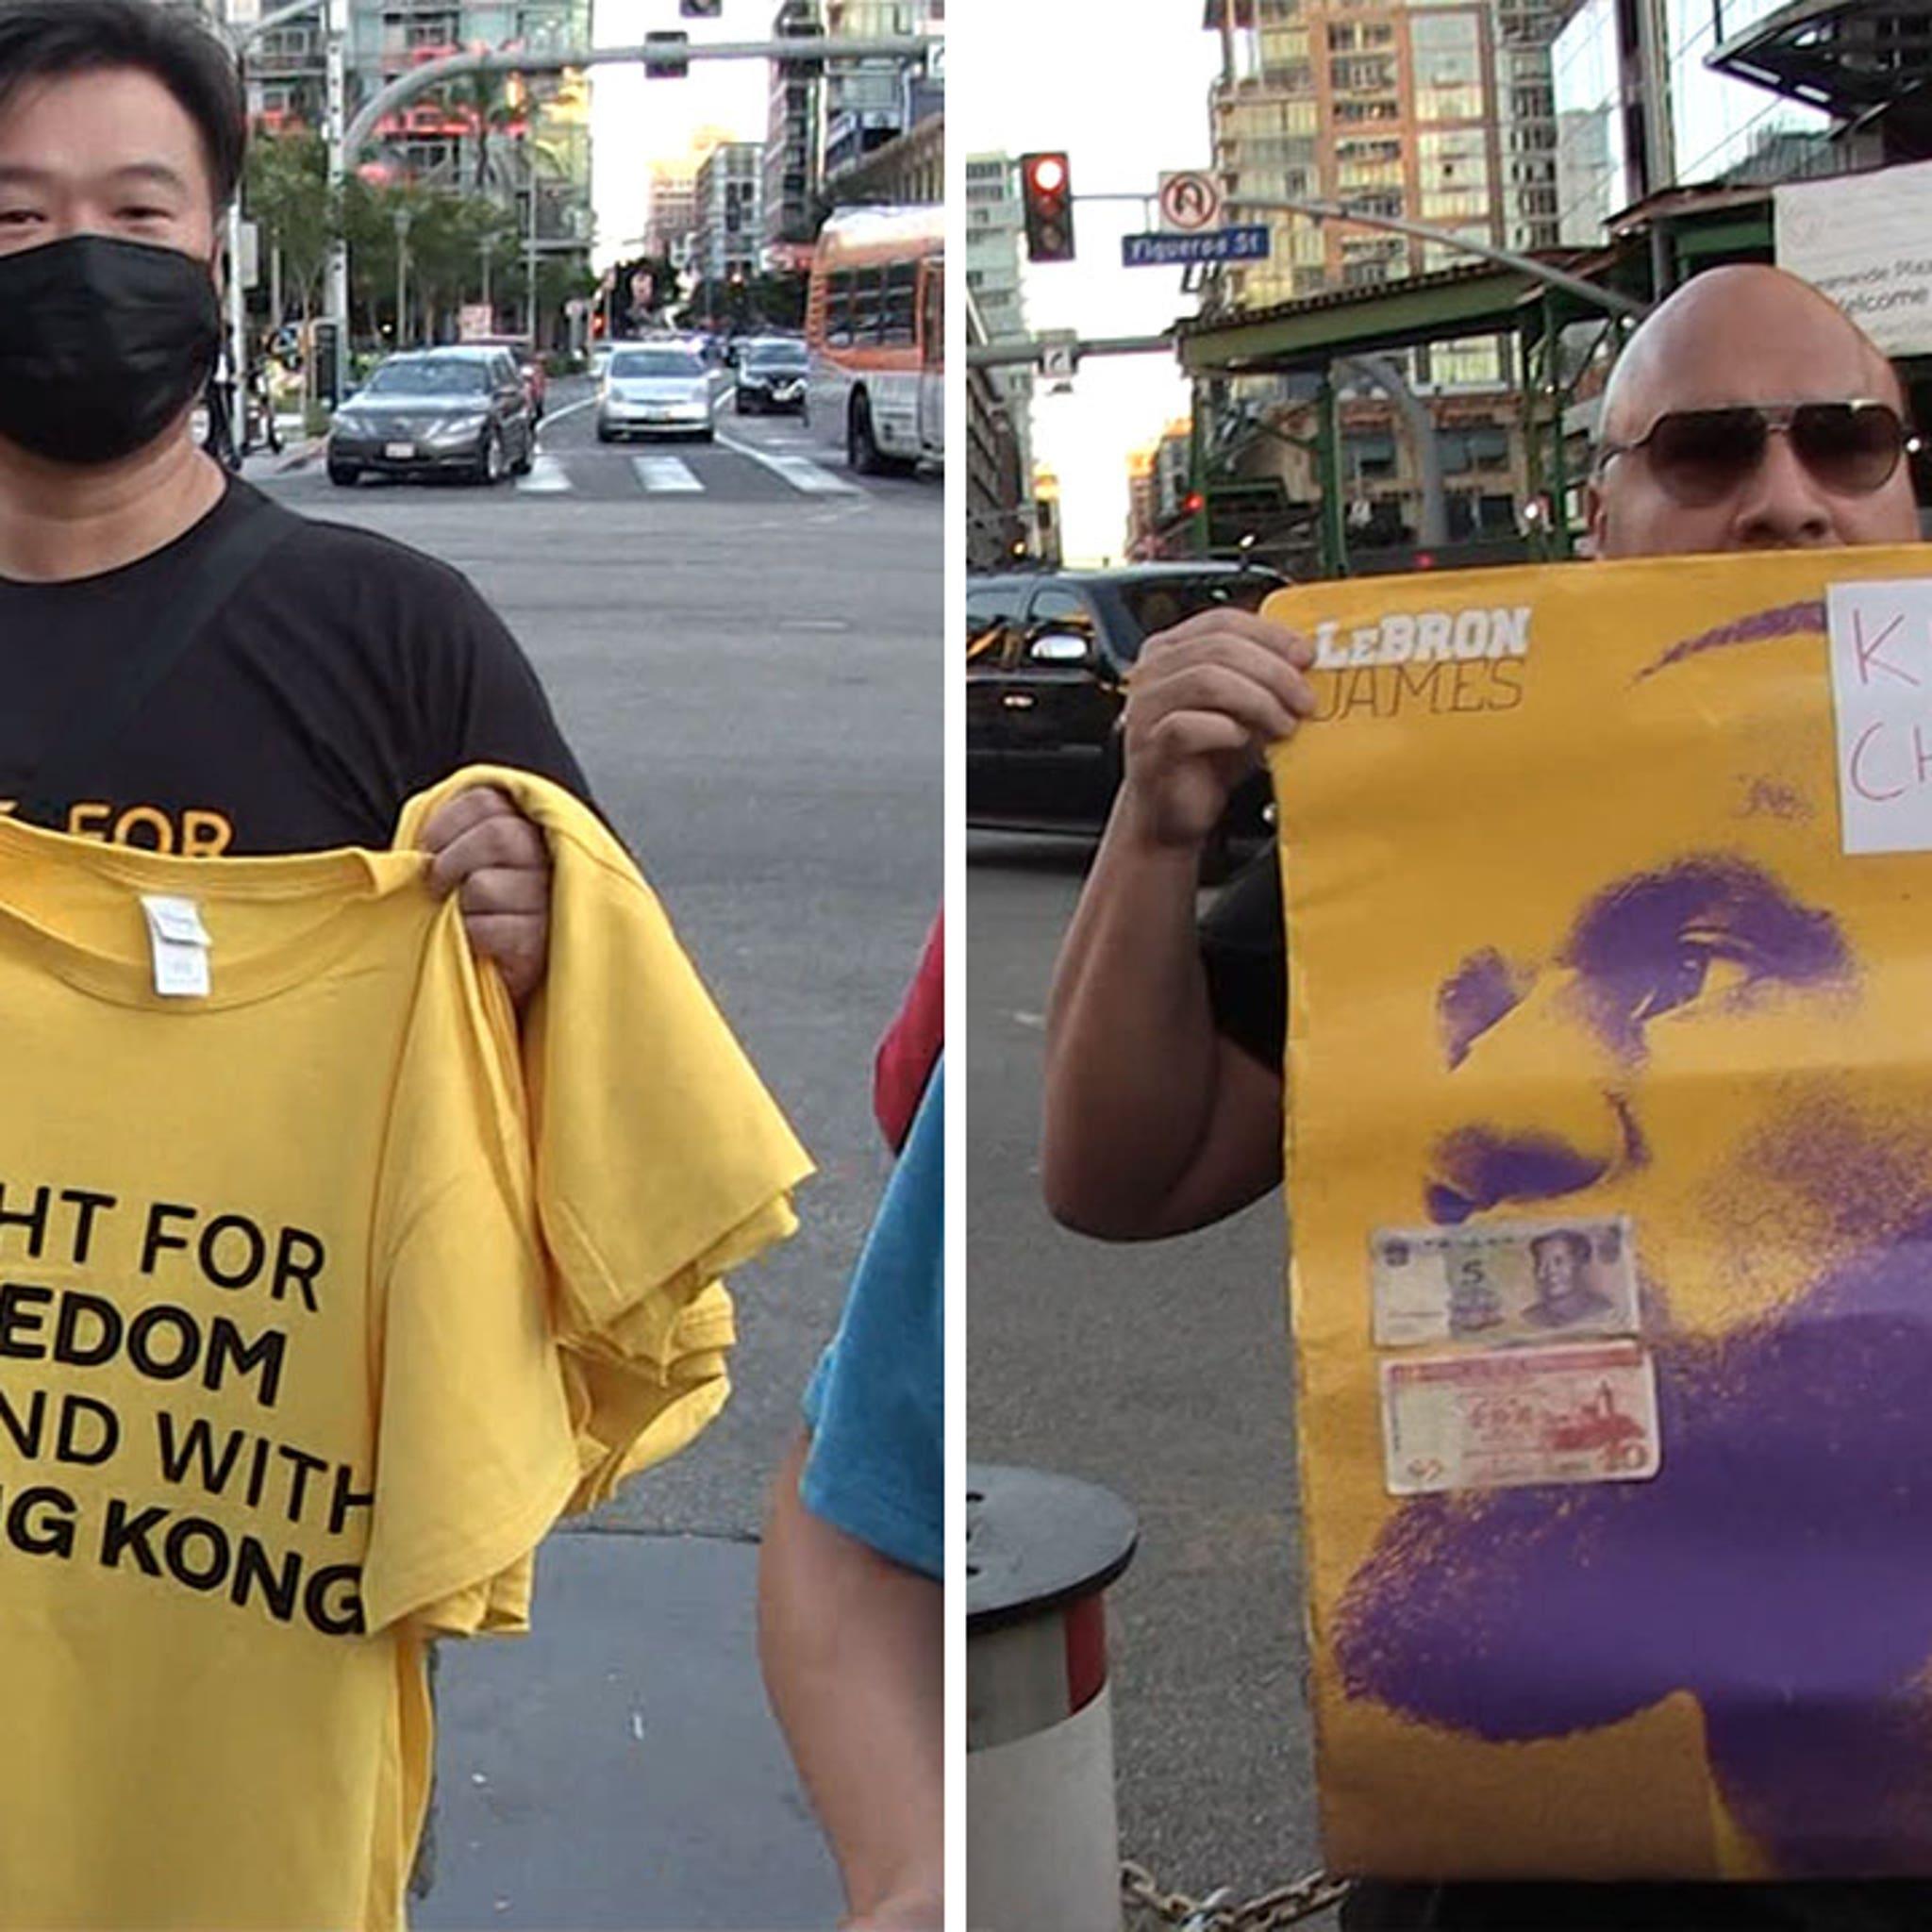 Hong Kong Protesters Targeted LeBron James Outside Lakers Game